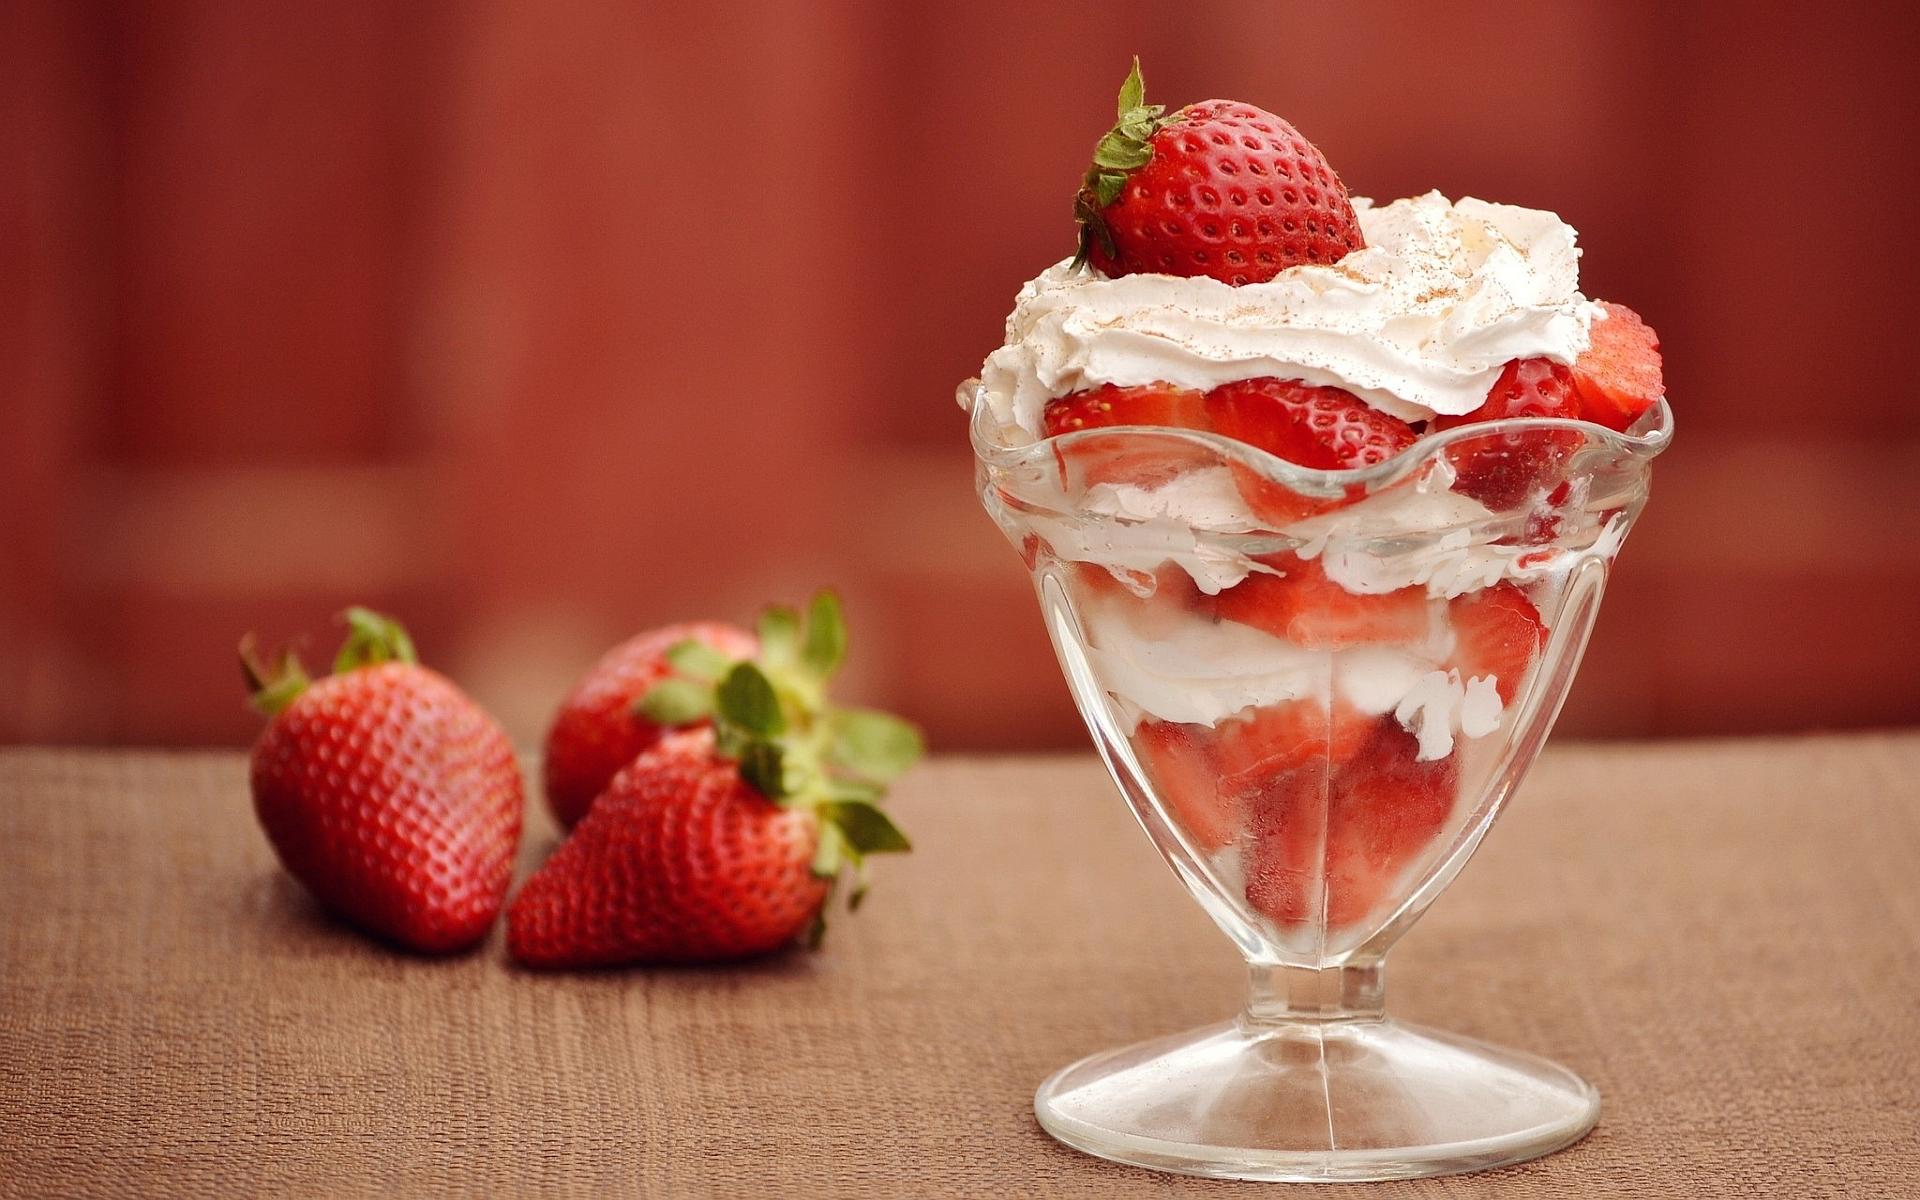 Cream strawberry dessert